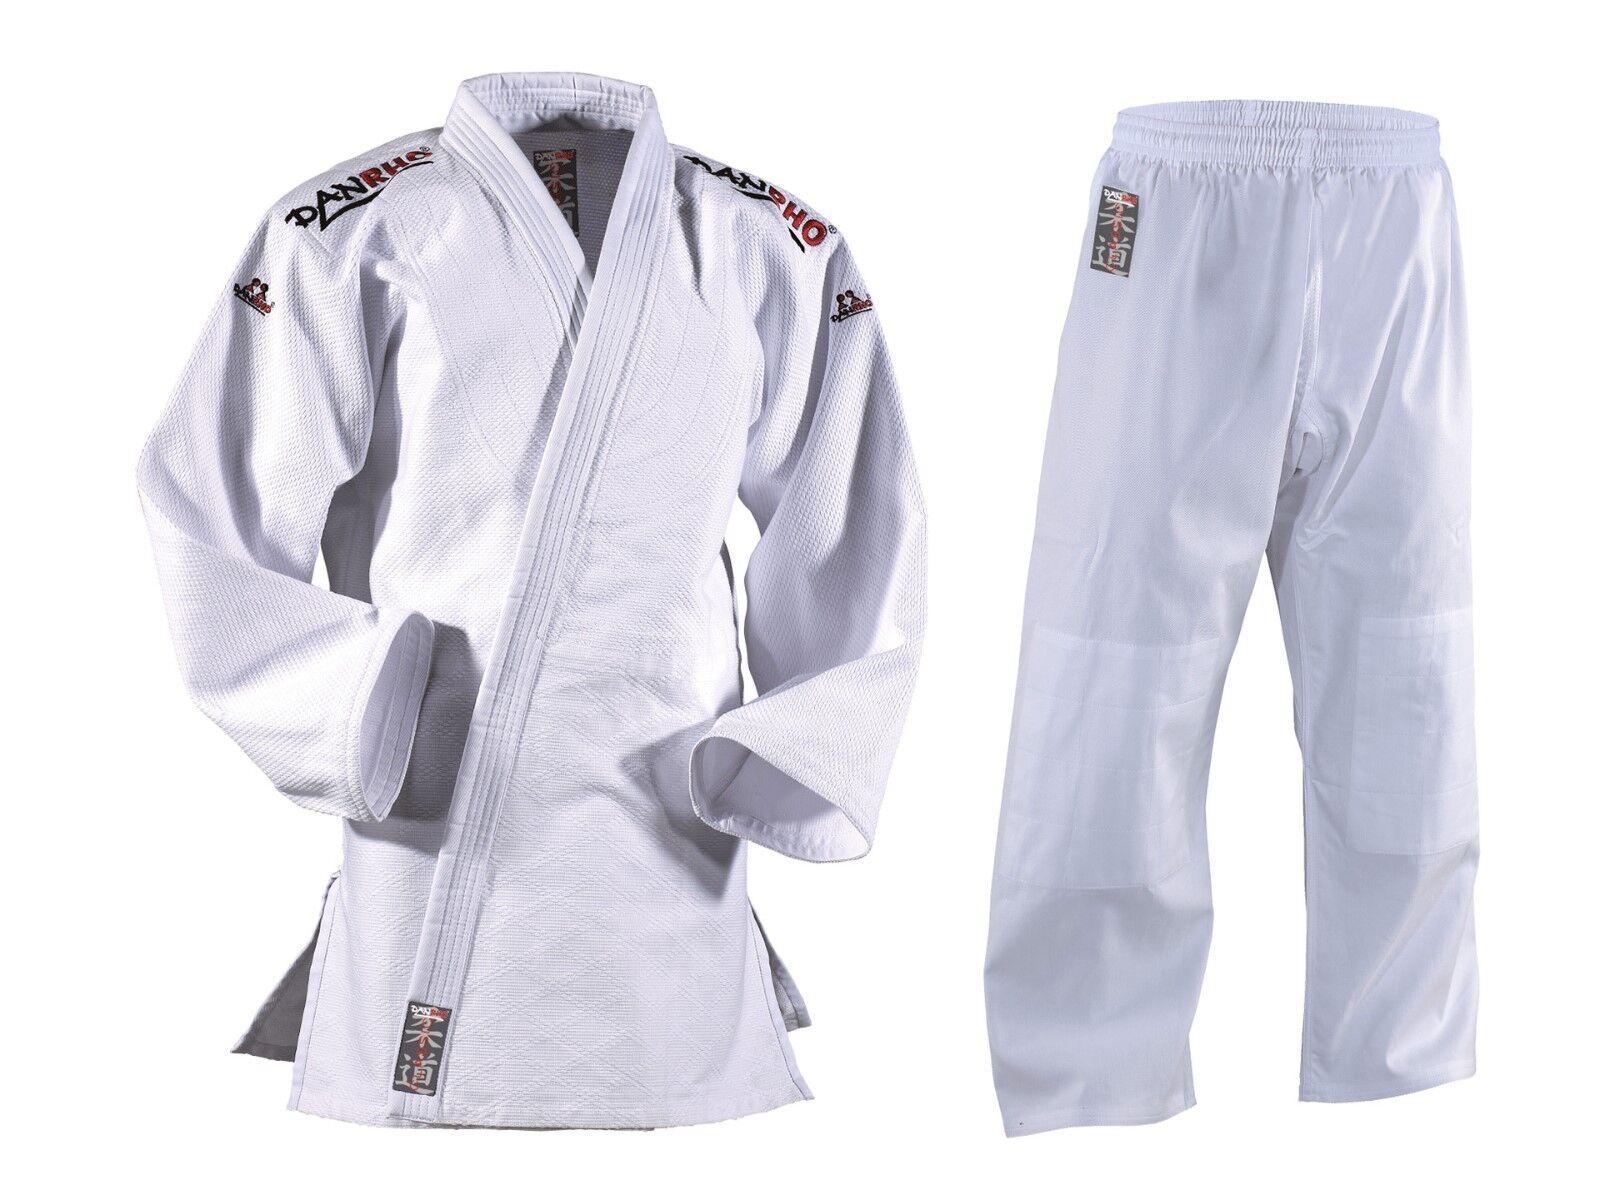 DANRHO Judoanzug Judoanzug Judoanzug Classic weiß. Größen 140-190cm. 100% Baumwolle. Judo 29cc99